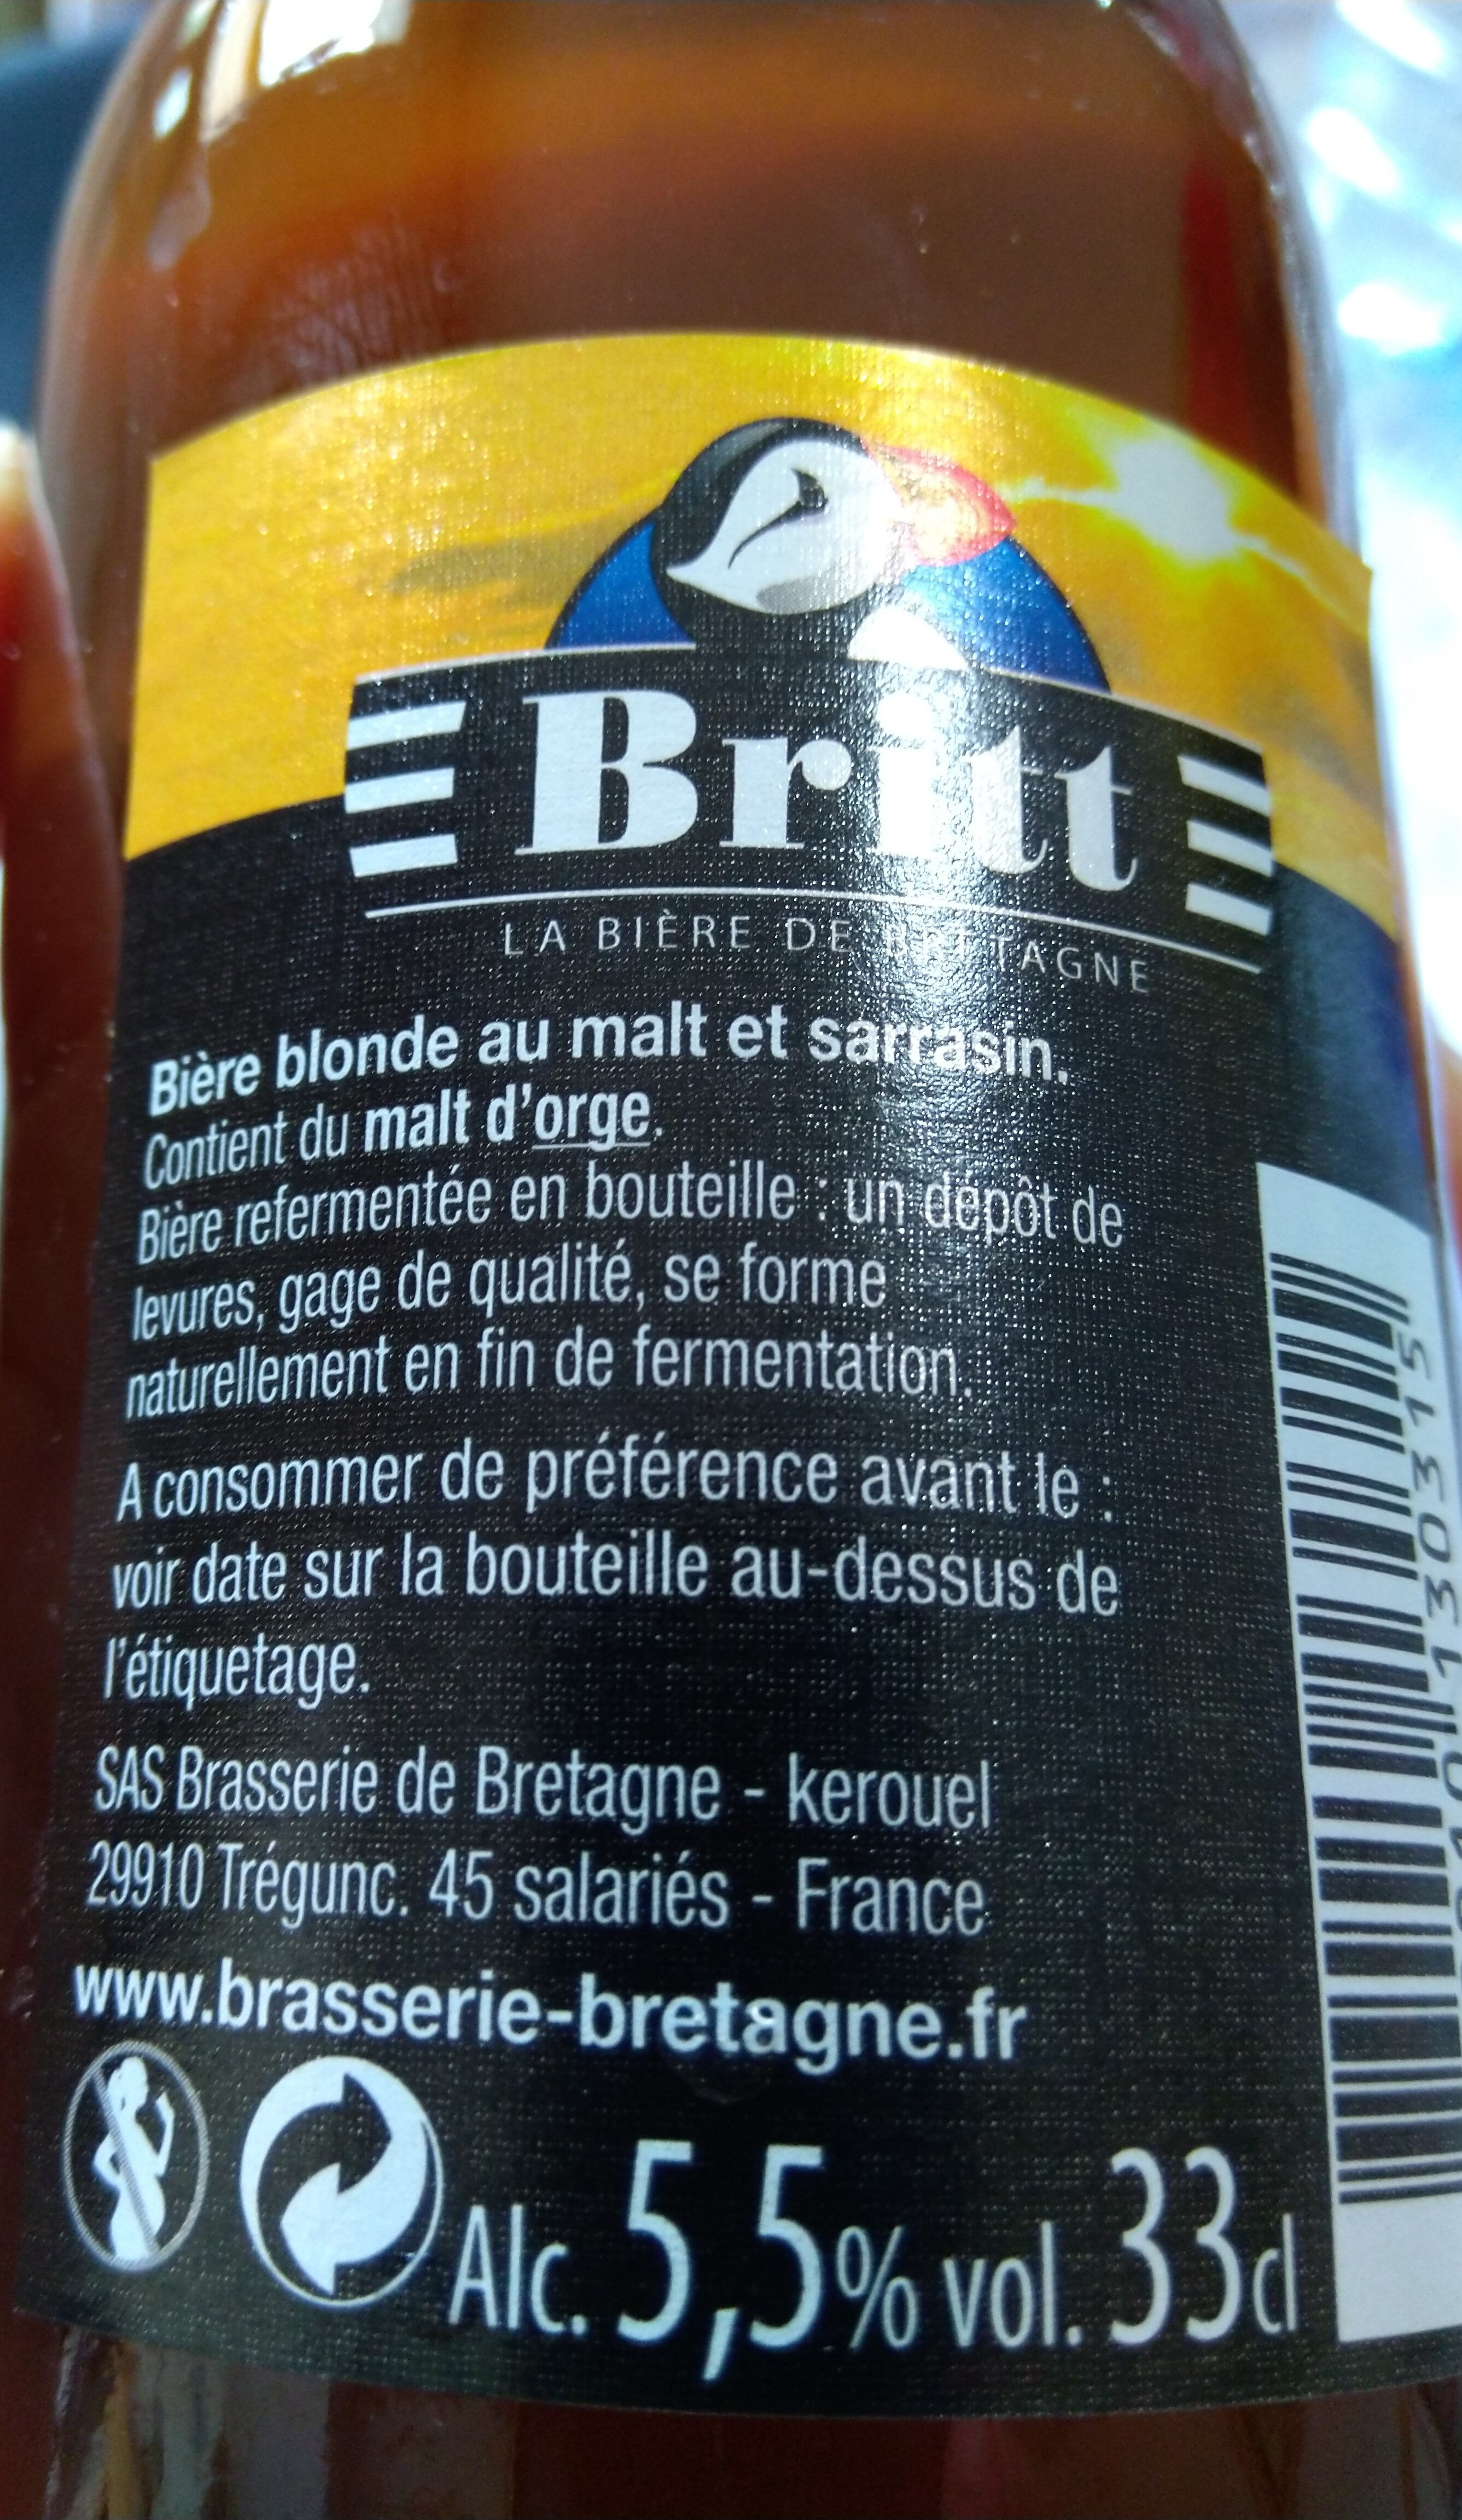 Britt Bière de Bretagne Melen au malt et sarrasin (6%) - Valori nutrizionali - fr